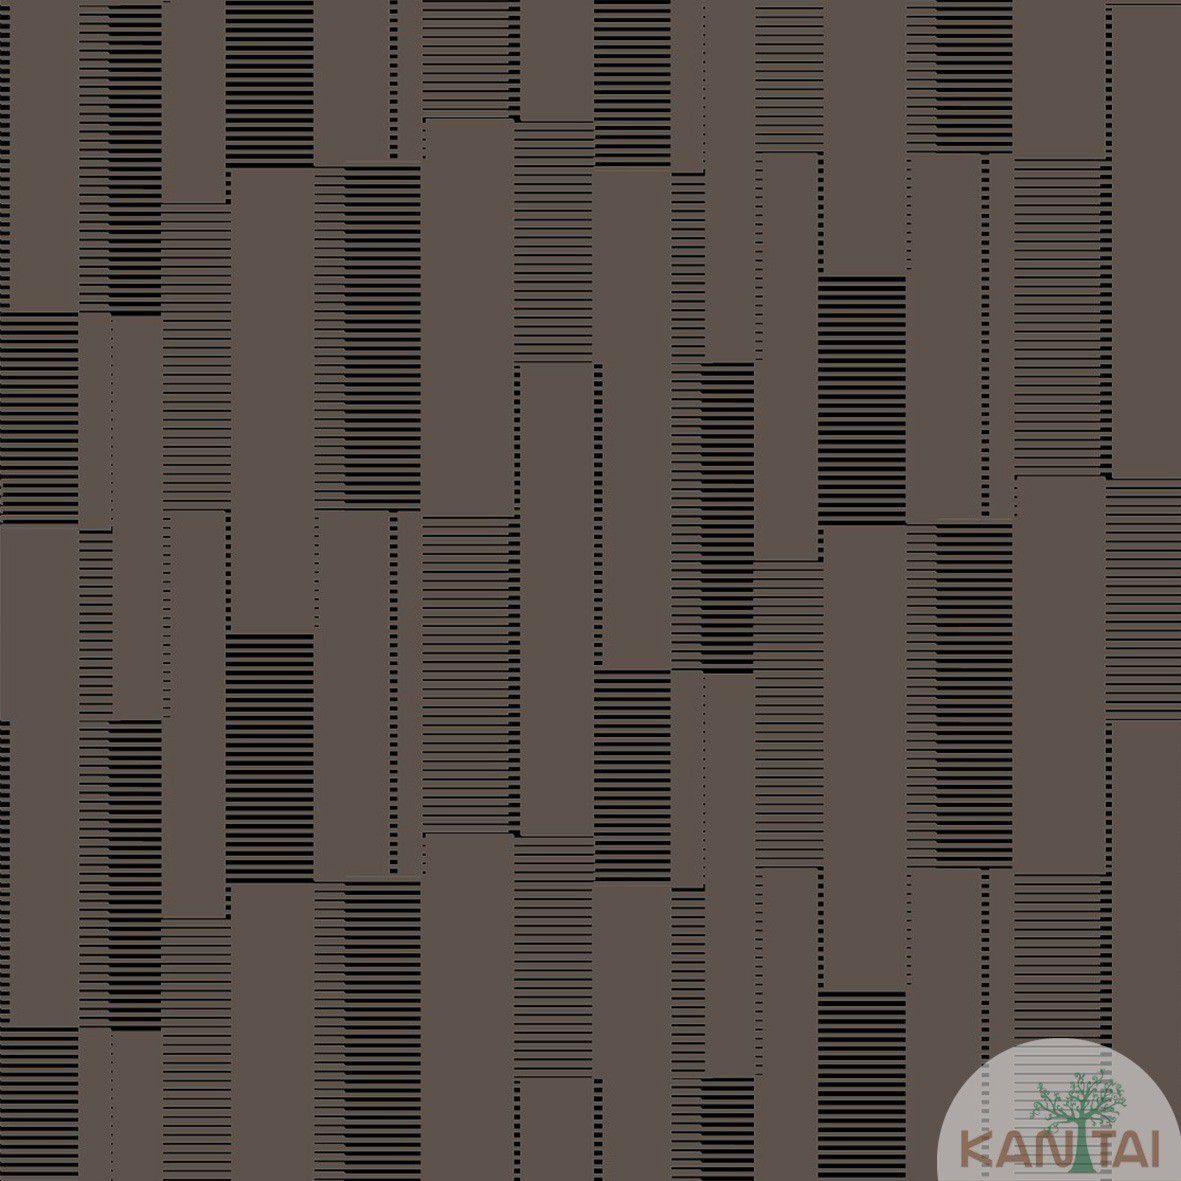 Papel de Parede   Kan Tai Vinilico Coleção Style Geométrico Bege, Preto